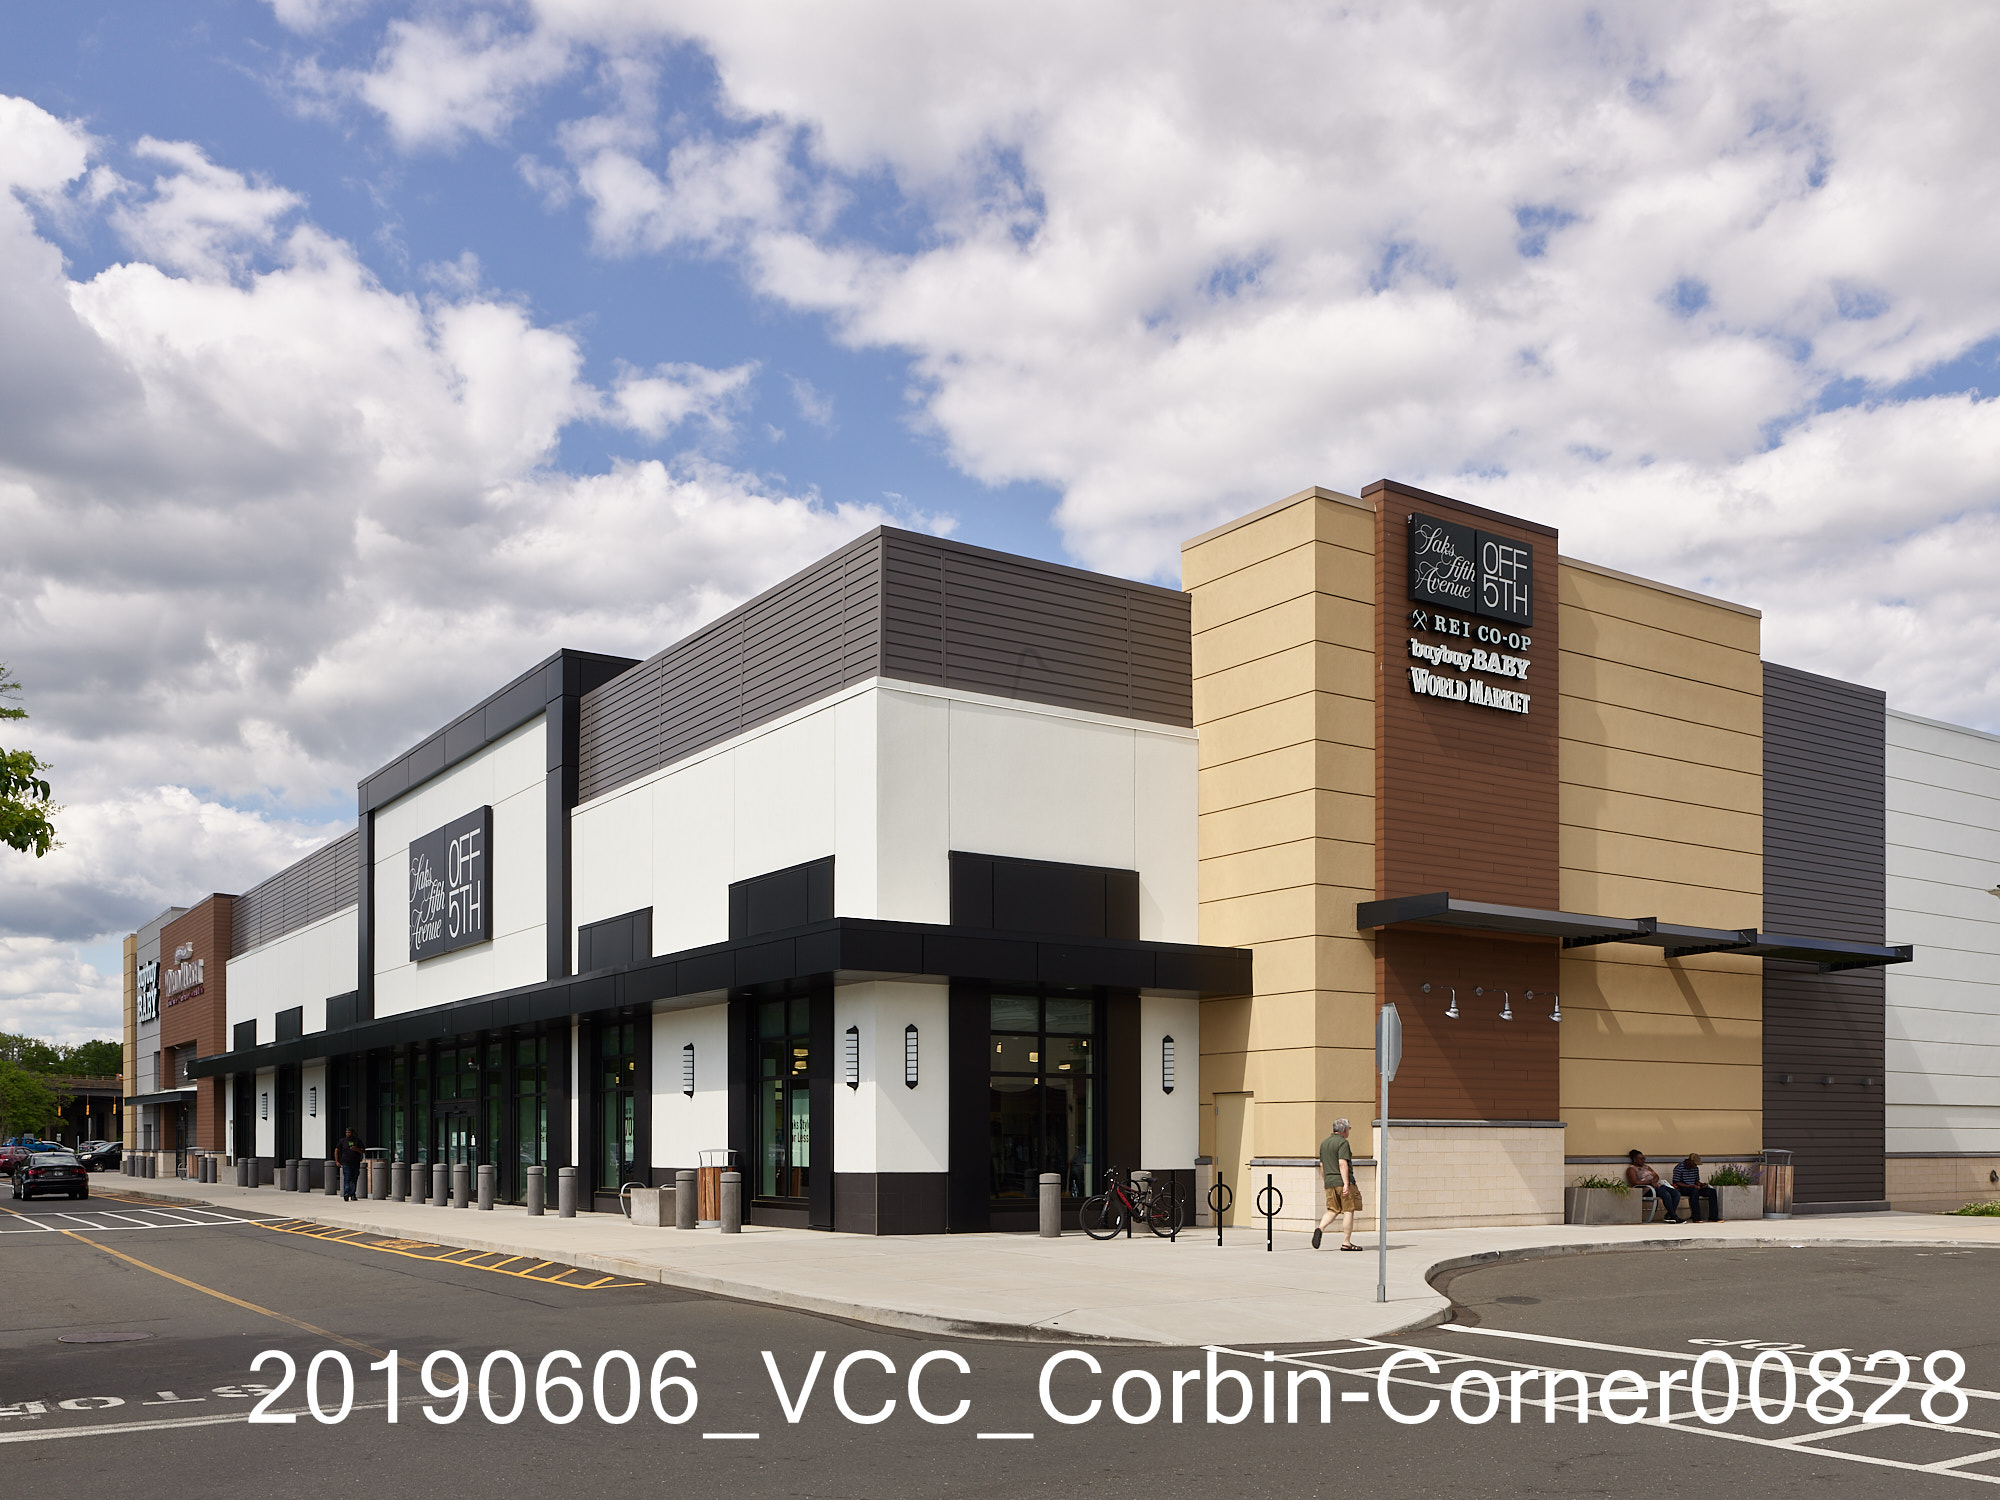 20190606_VCC_Corbin-Corner00828.jpg